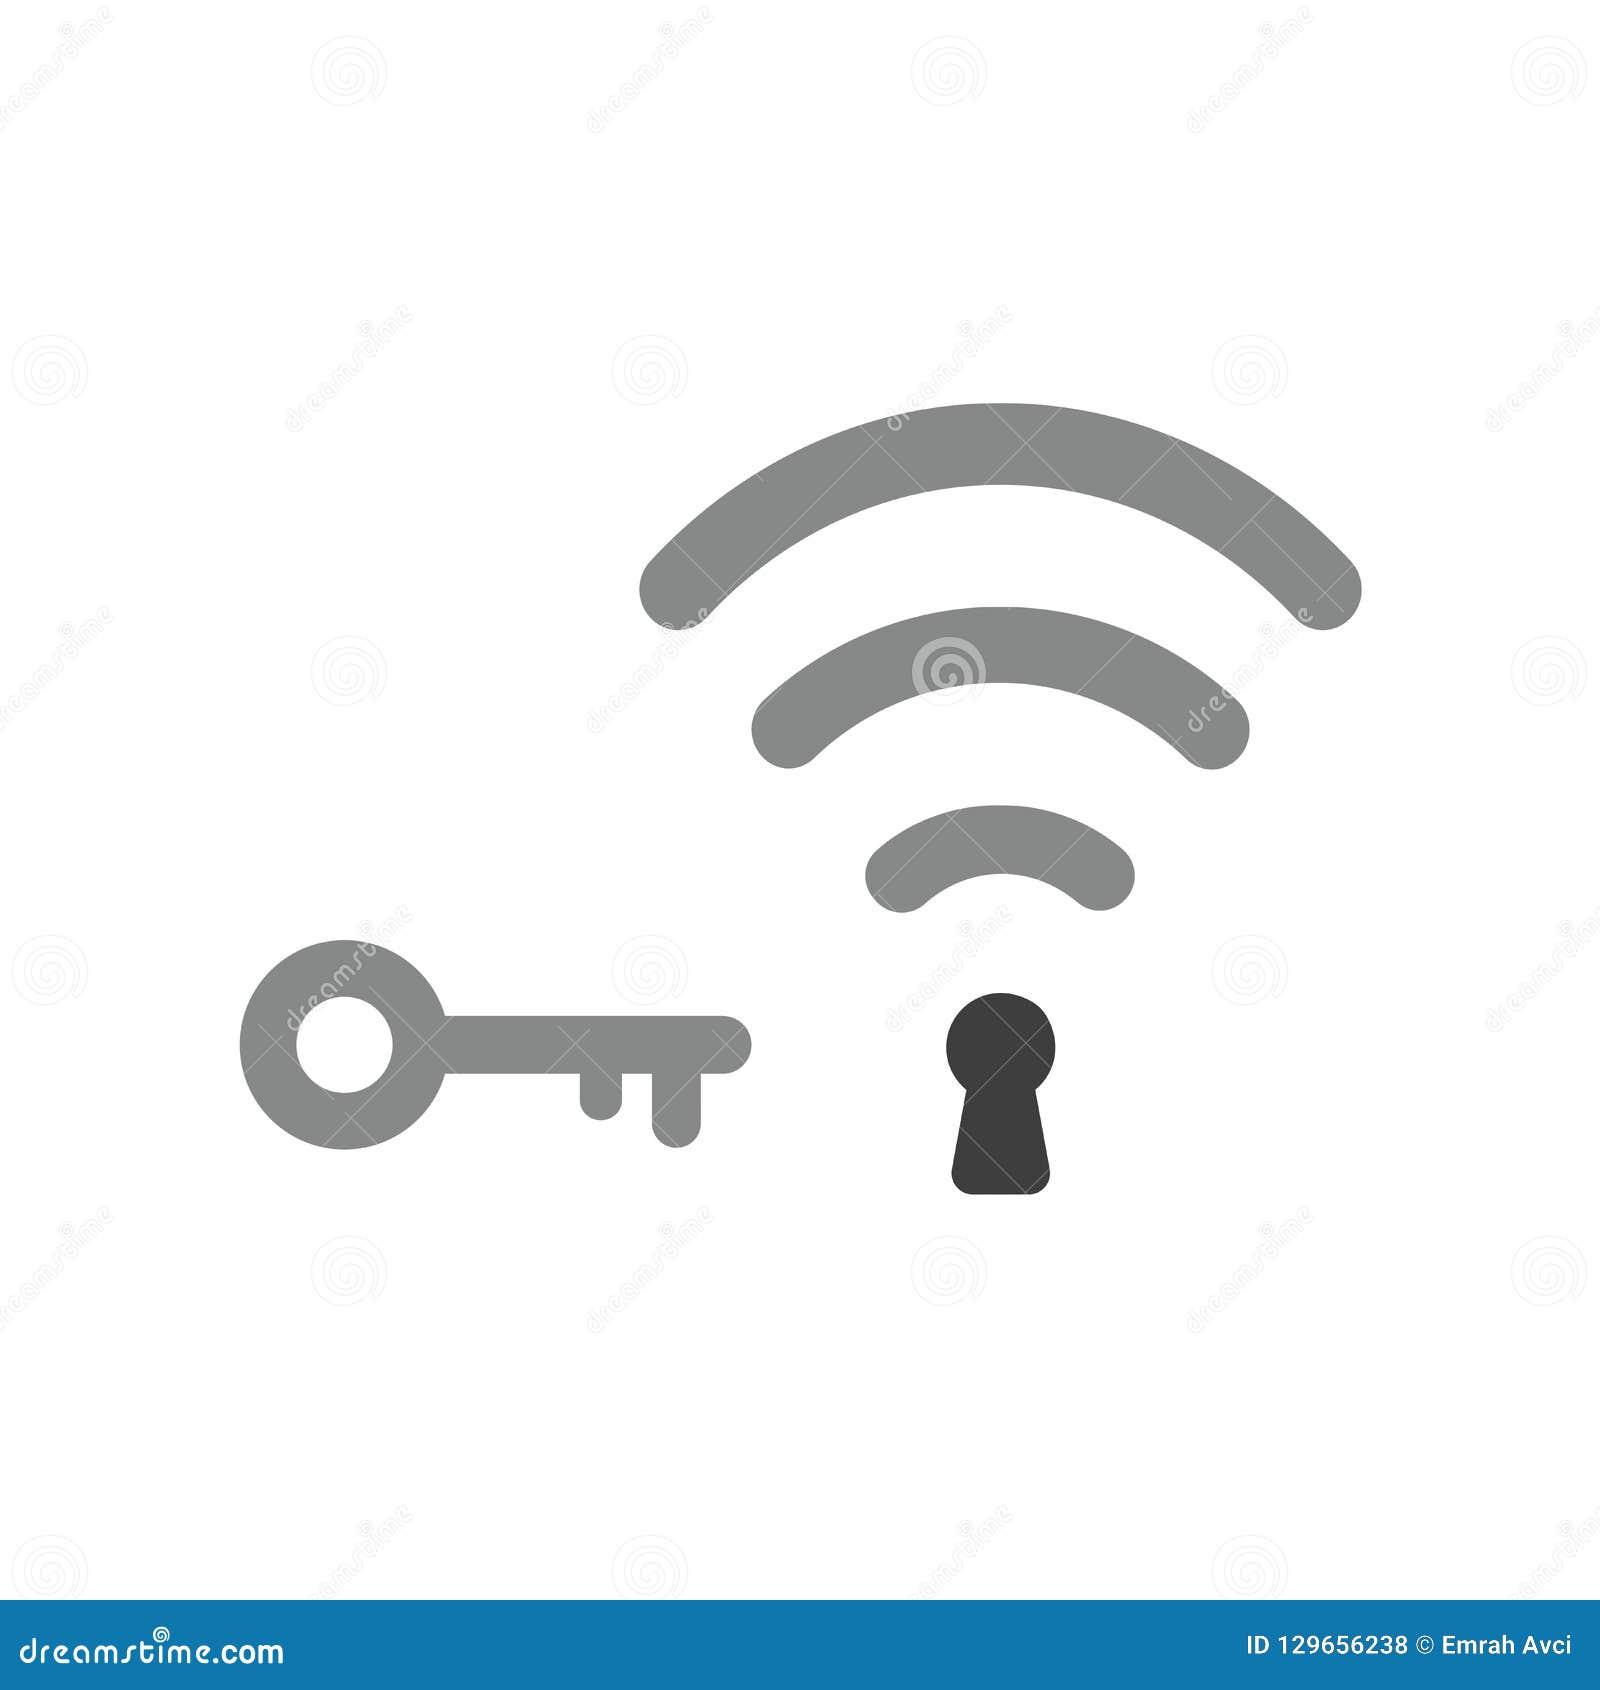 Vectorpictogramconcept draadloos wifisymbool met sleutelgat en sleutel